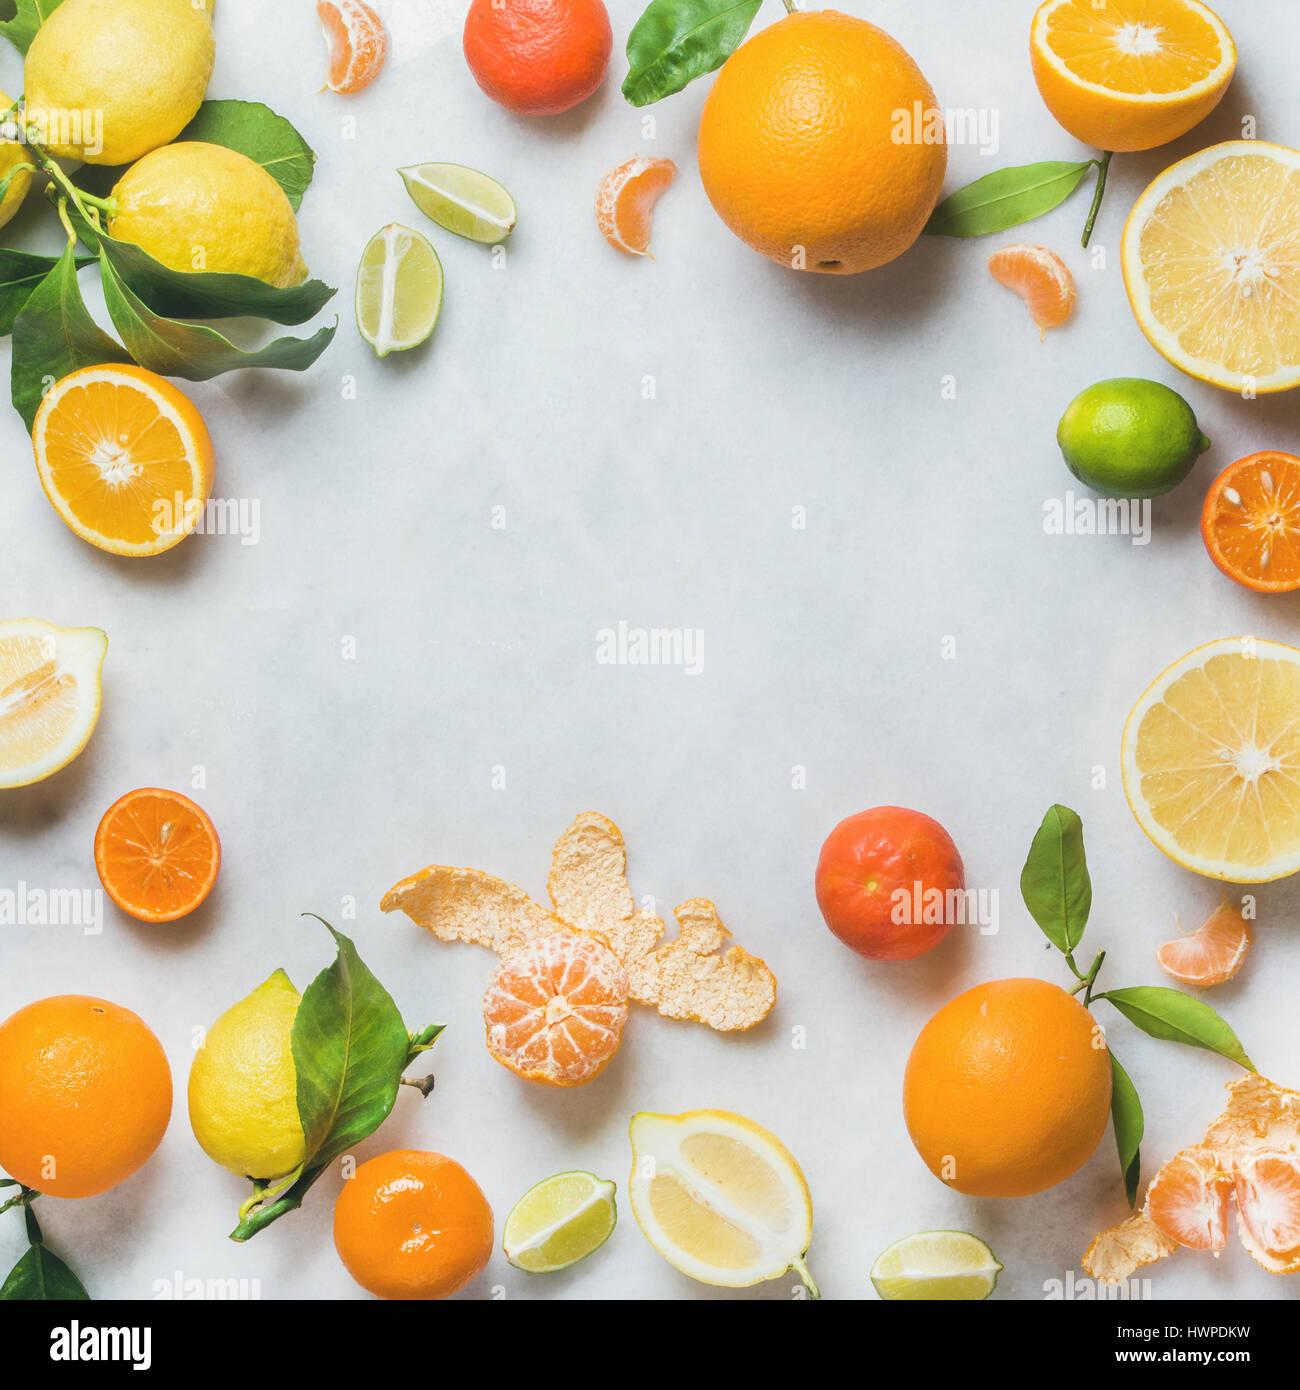 Variedad de frutos cítricos frescos para hacer zumo o batido Imagen De Stock